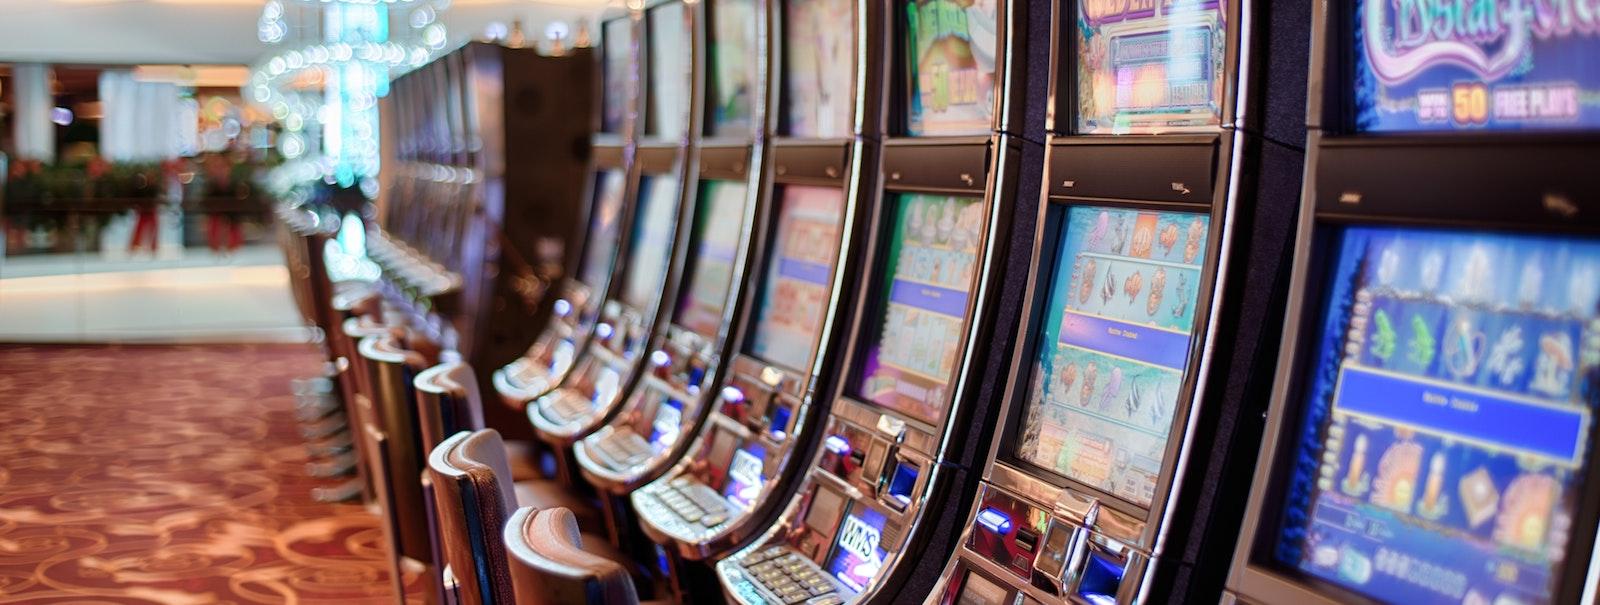 casino-gaming-slots